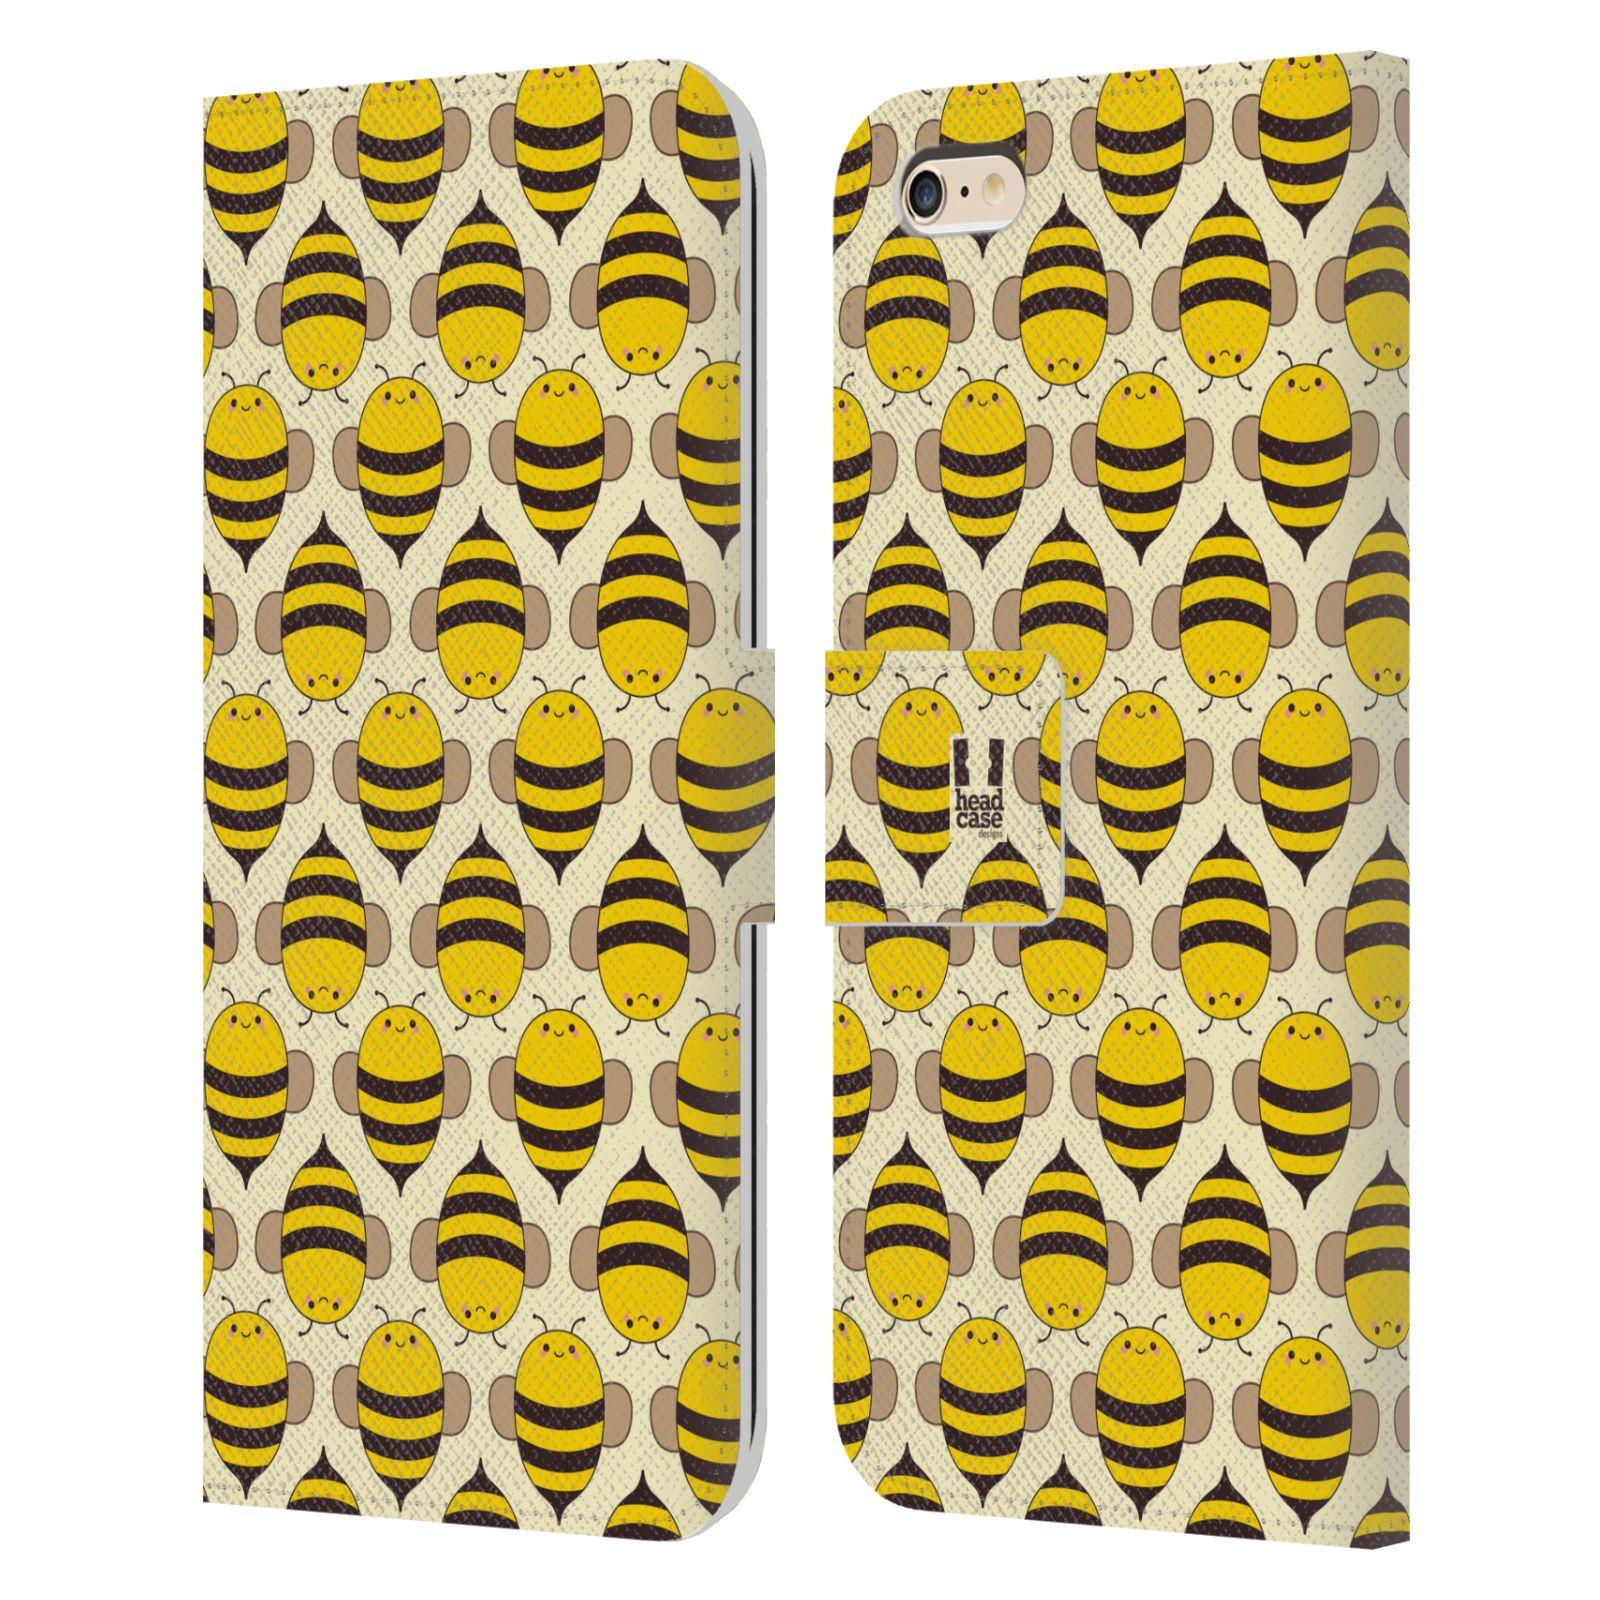 HEAD CASE Flipové pouzdro pro mobil Apple Iphone 6 PLUS / 6S PLUS VČELÍ VZOR kolonie včelek